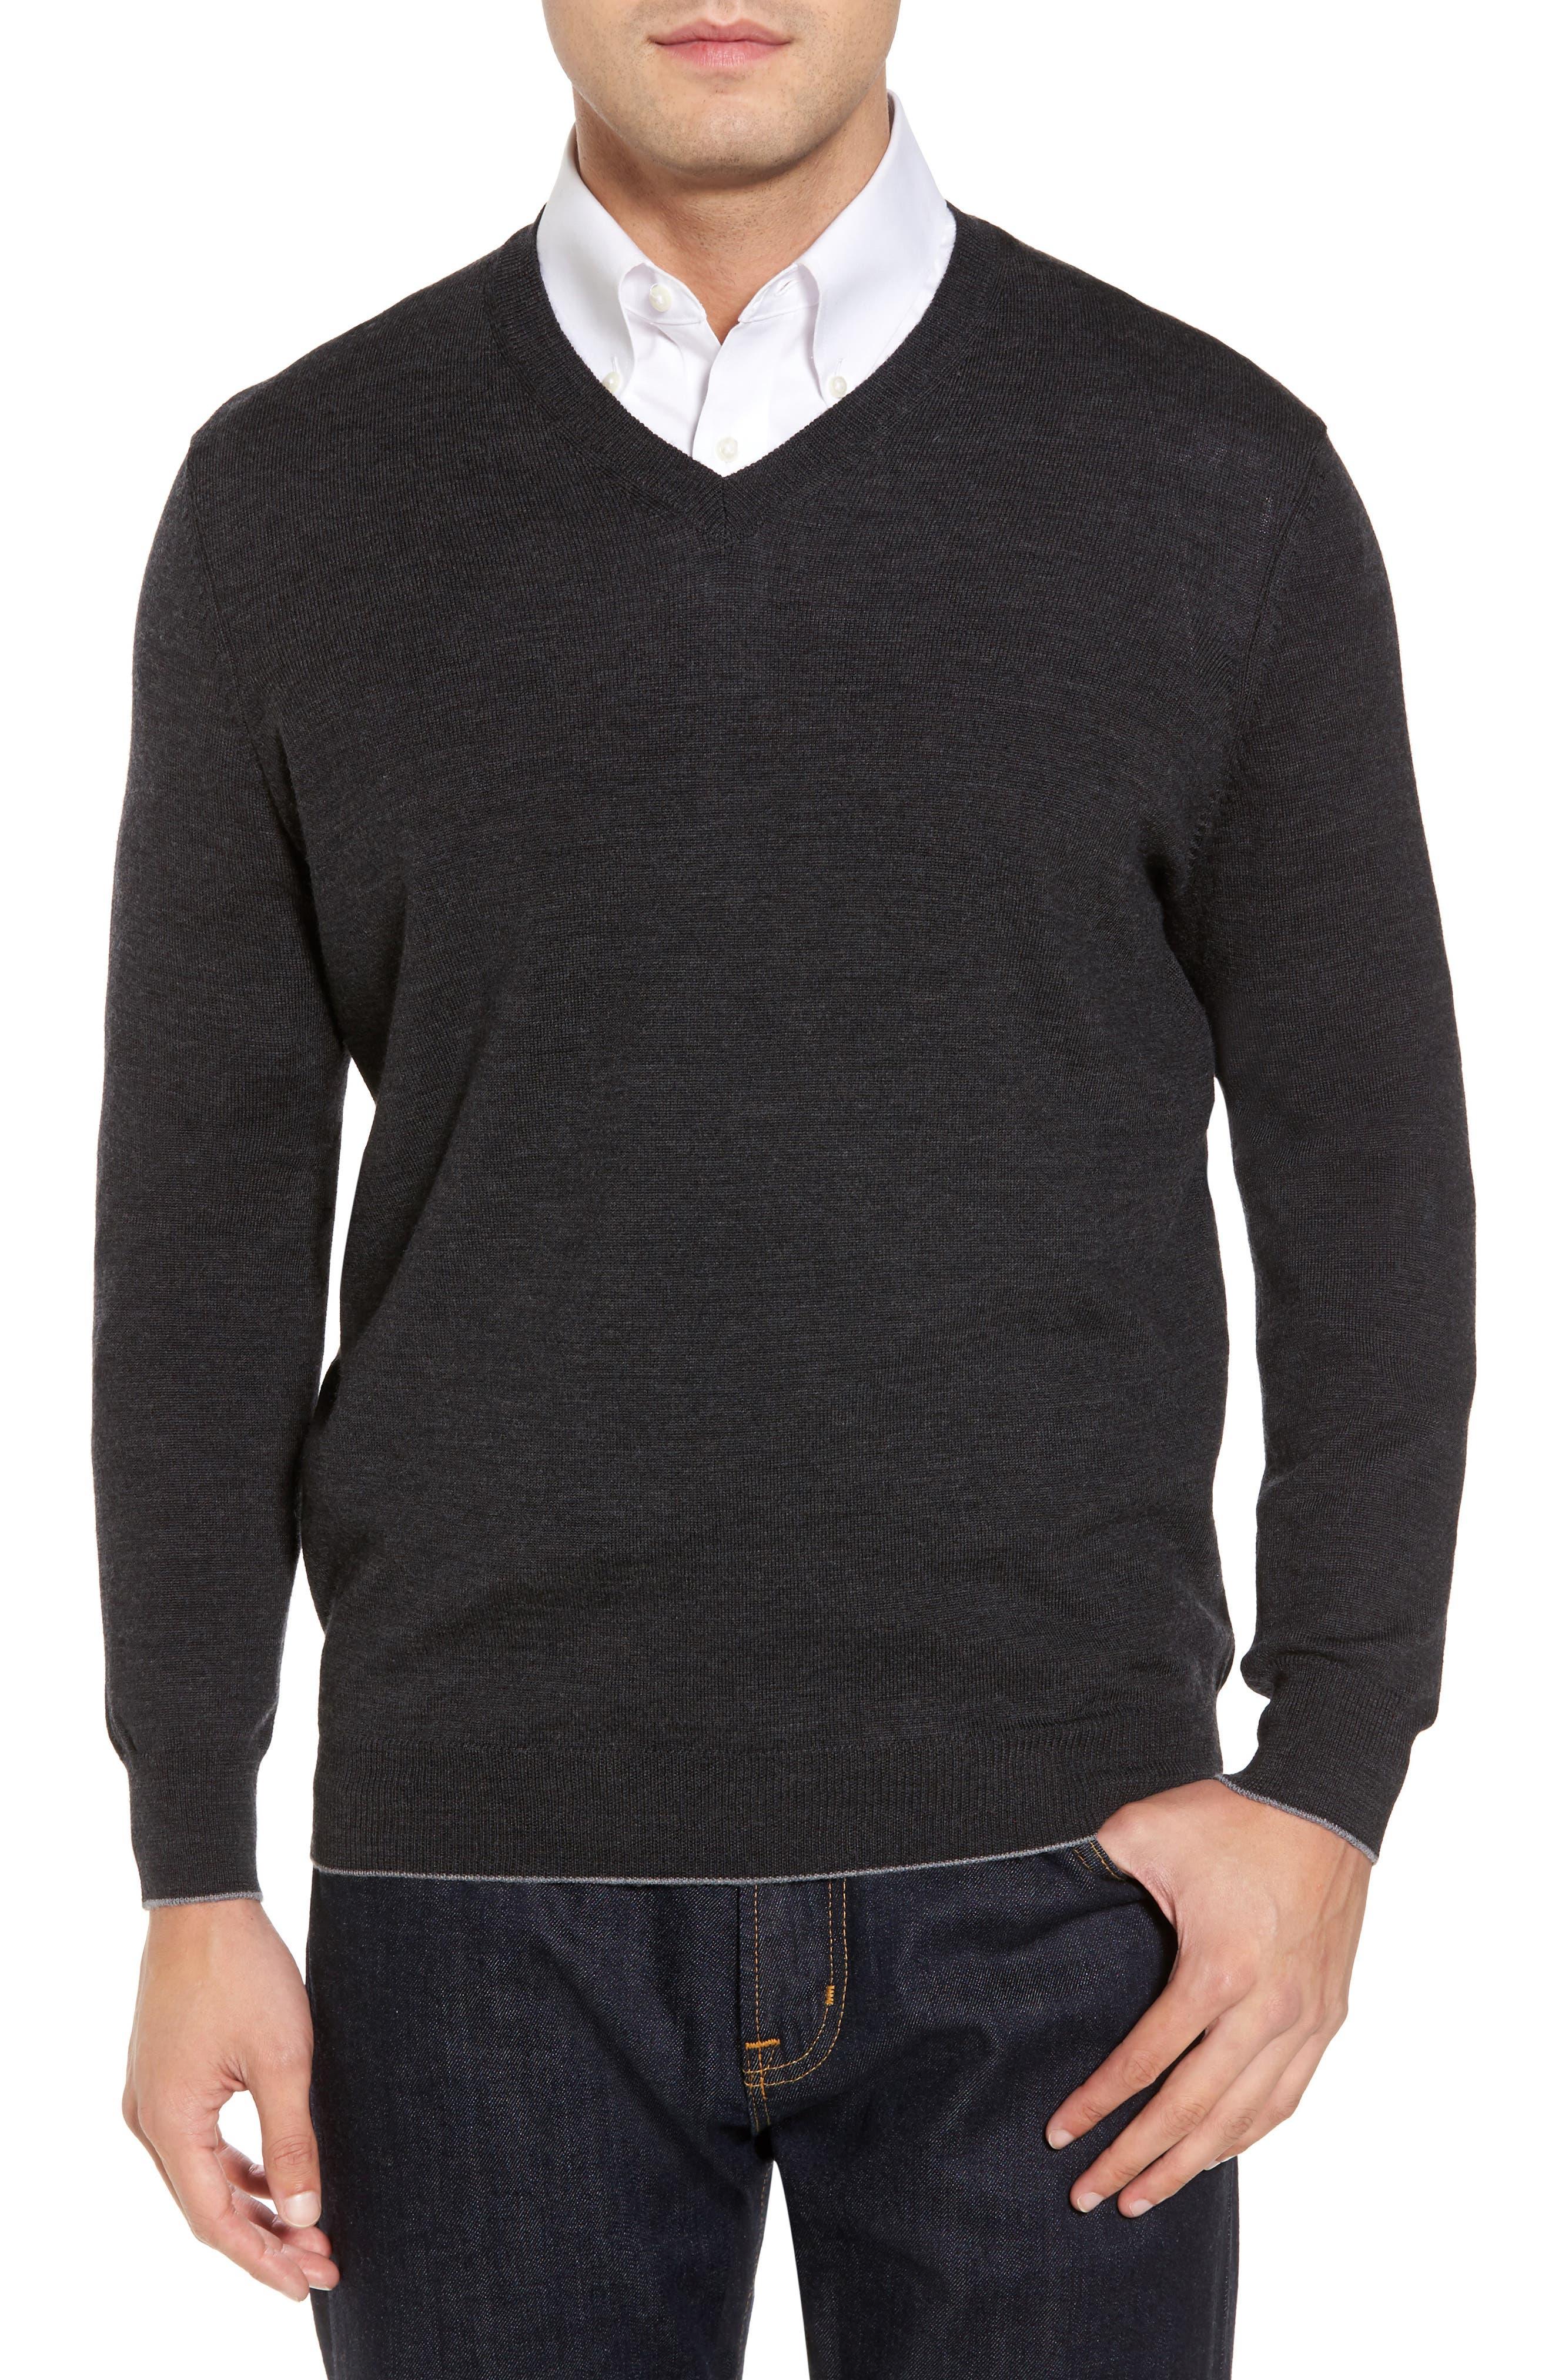 Merino Wool Blend V-Neck Sweater,                             Main thumbnail 1, color,                             020